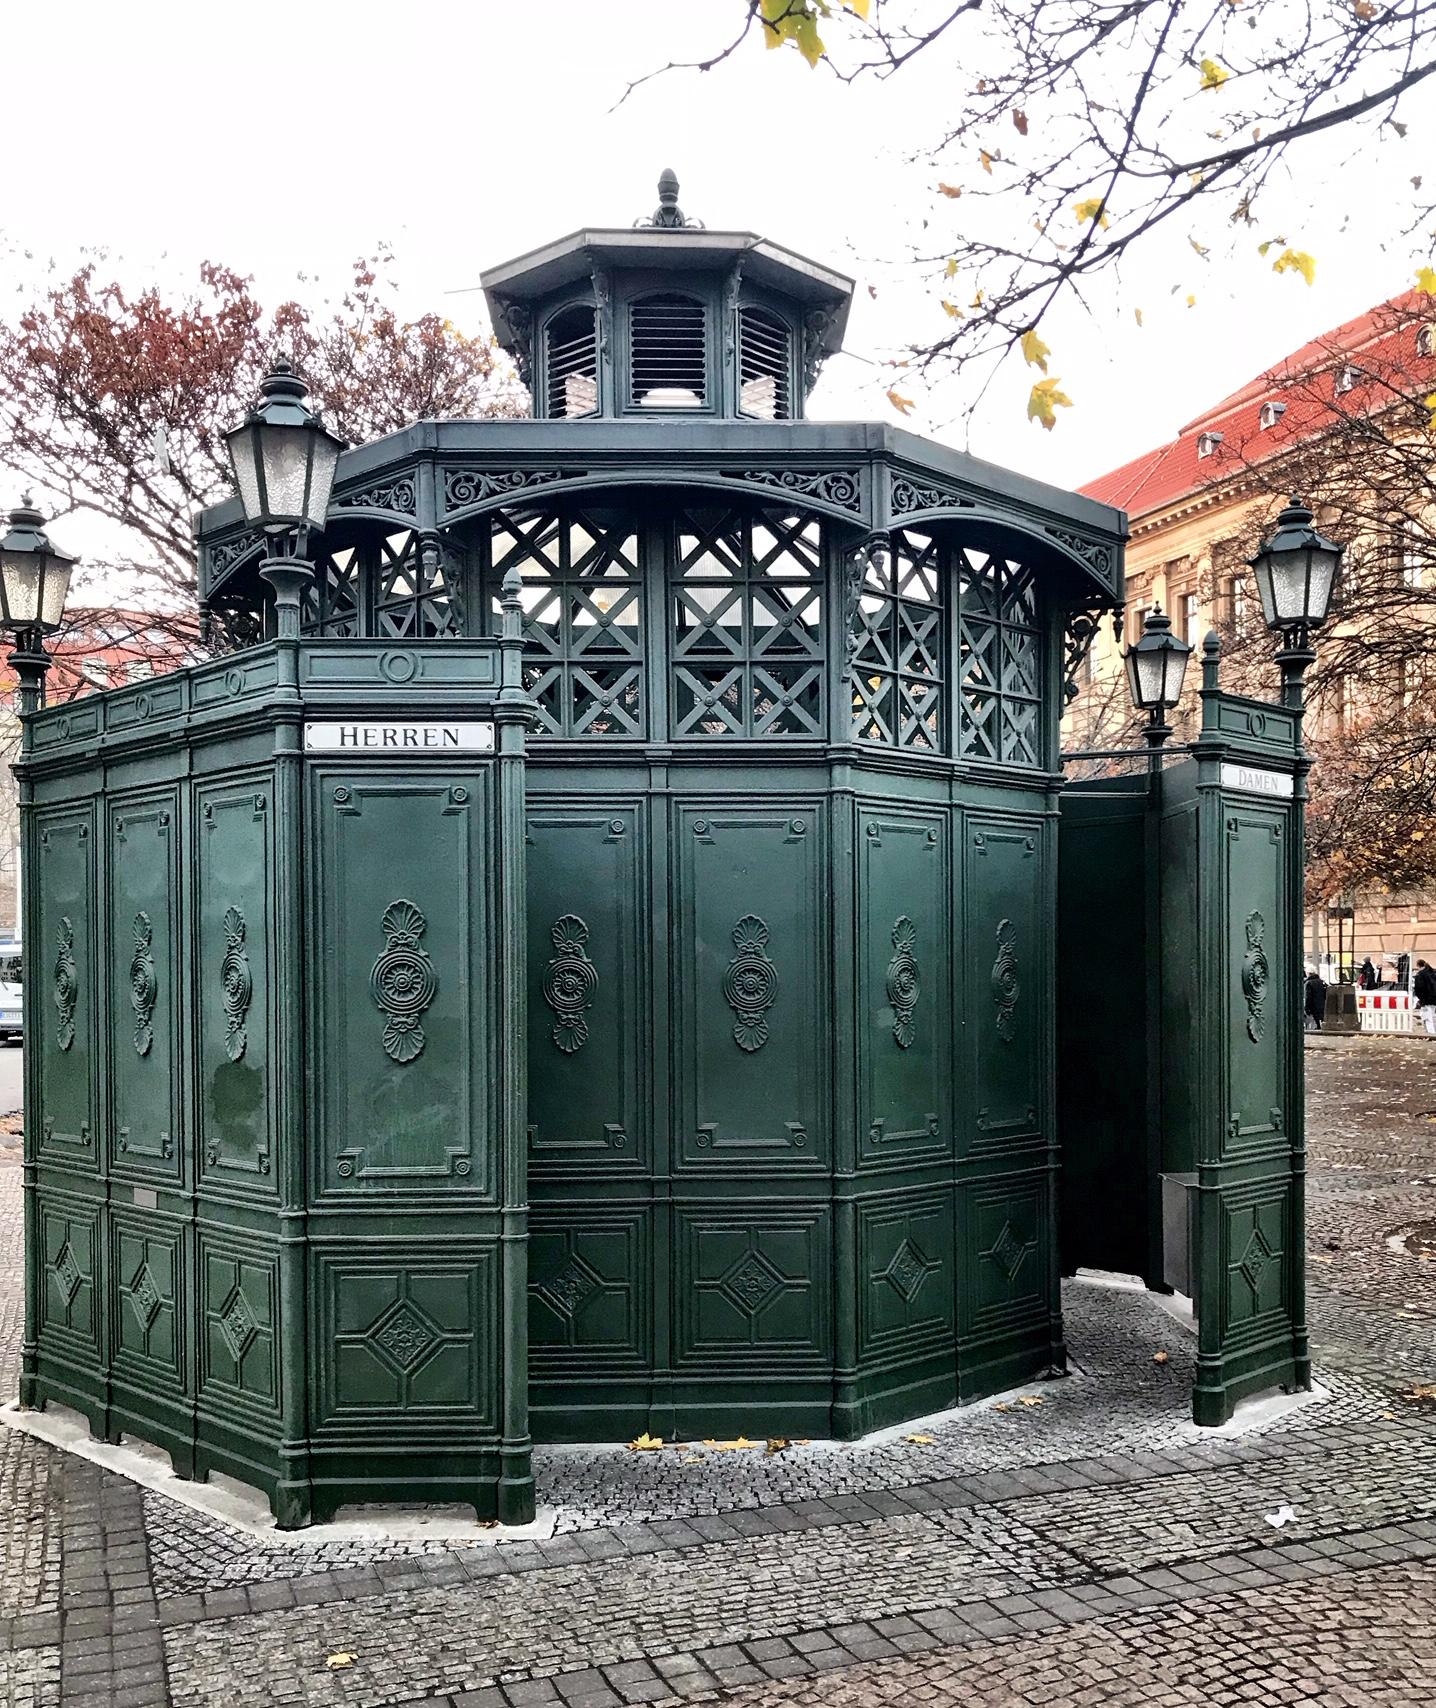 Berlin's oldest public toilet.